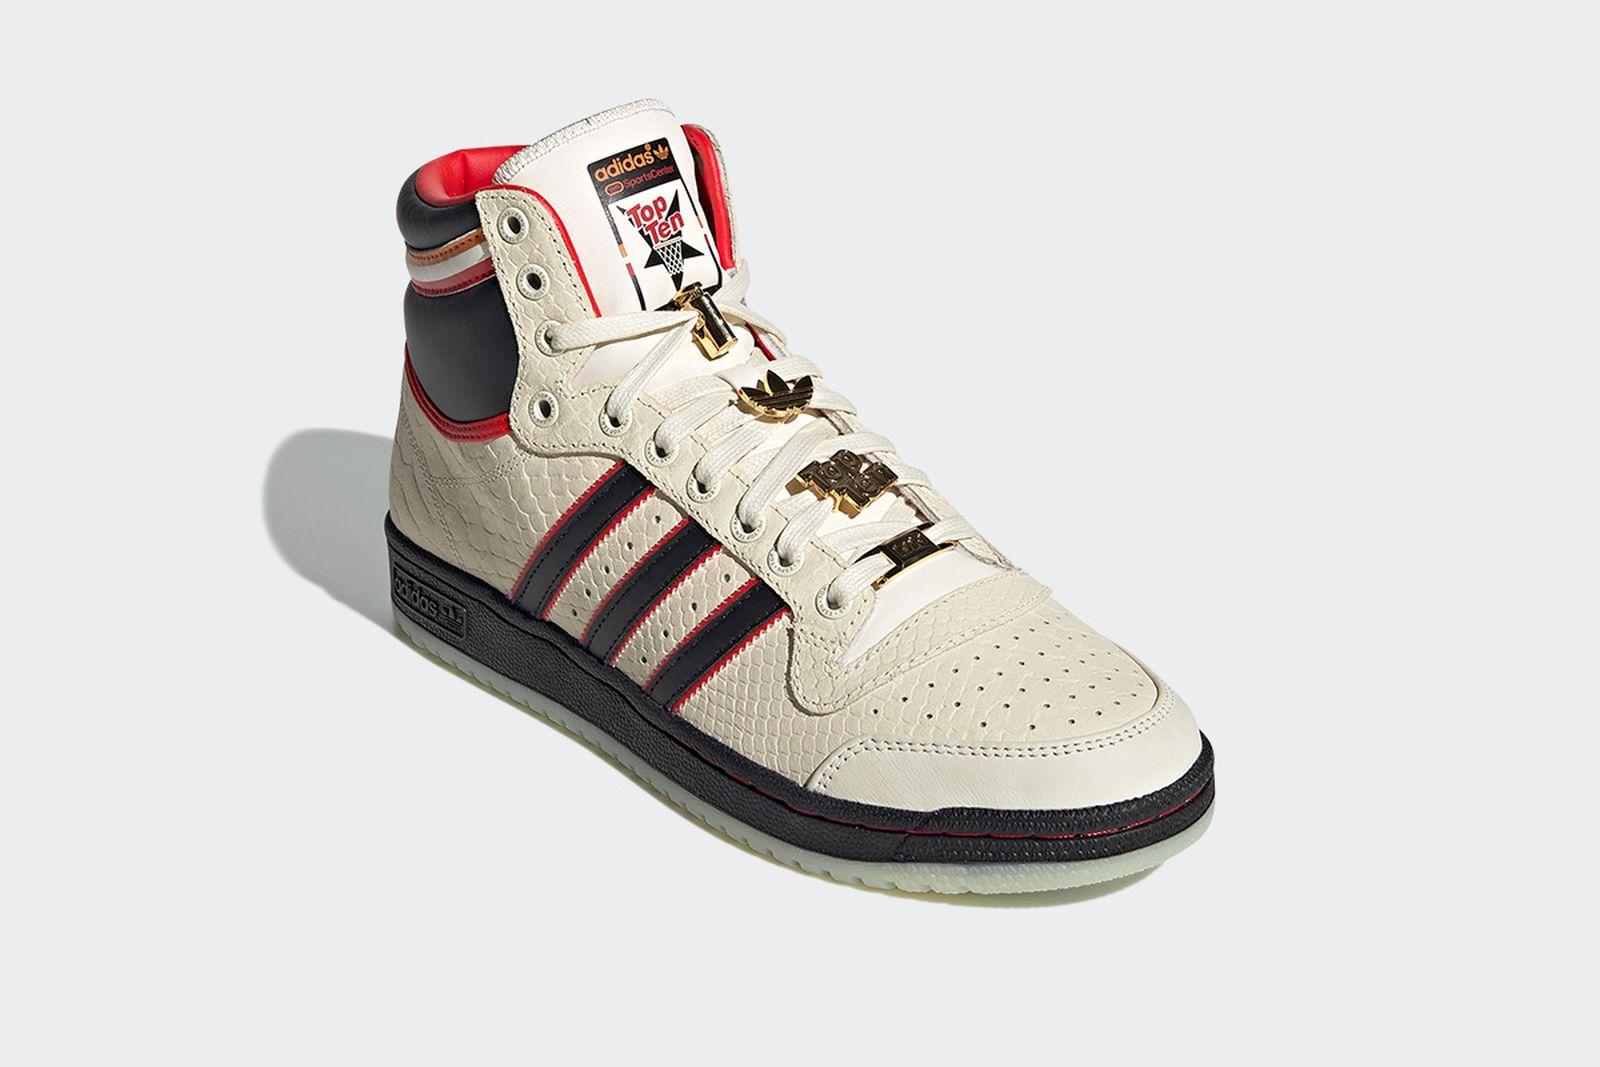 epsn-adidas-top-ten-hi-release-info-04